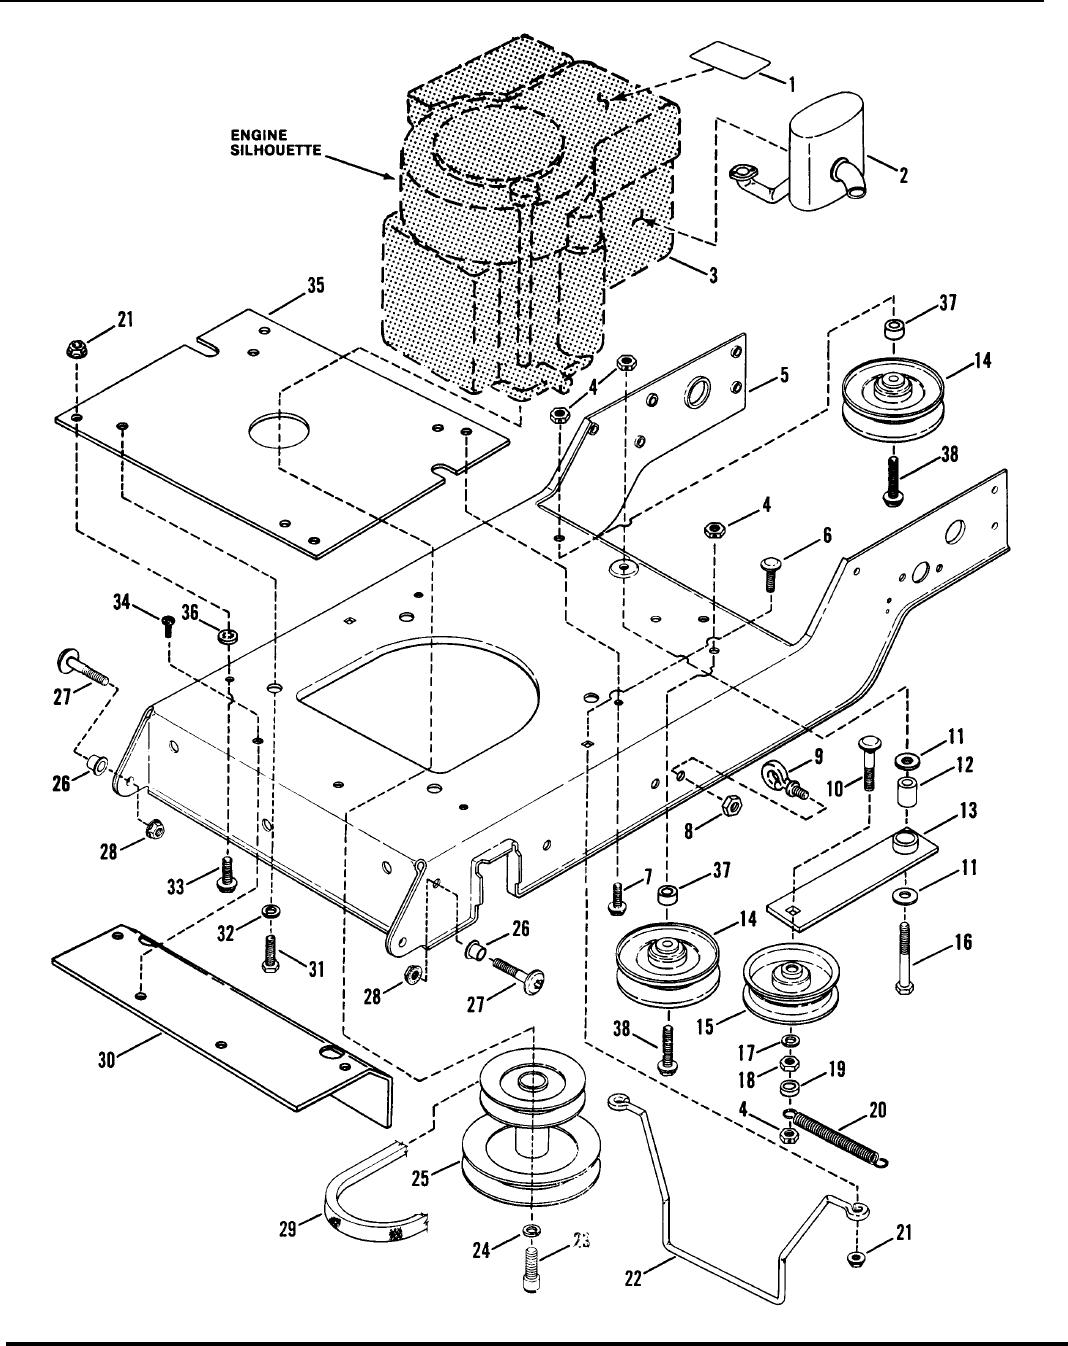 Engine base drive parts